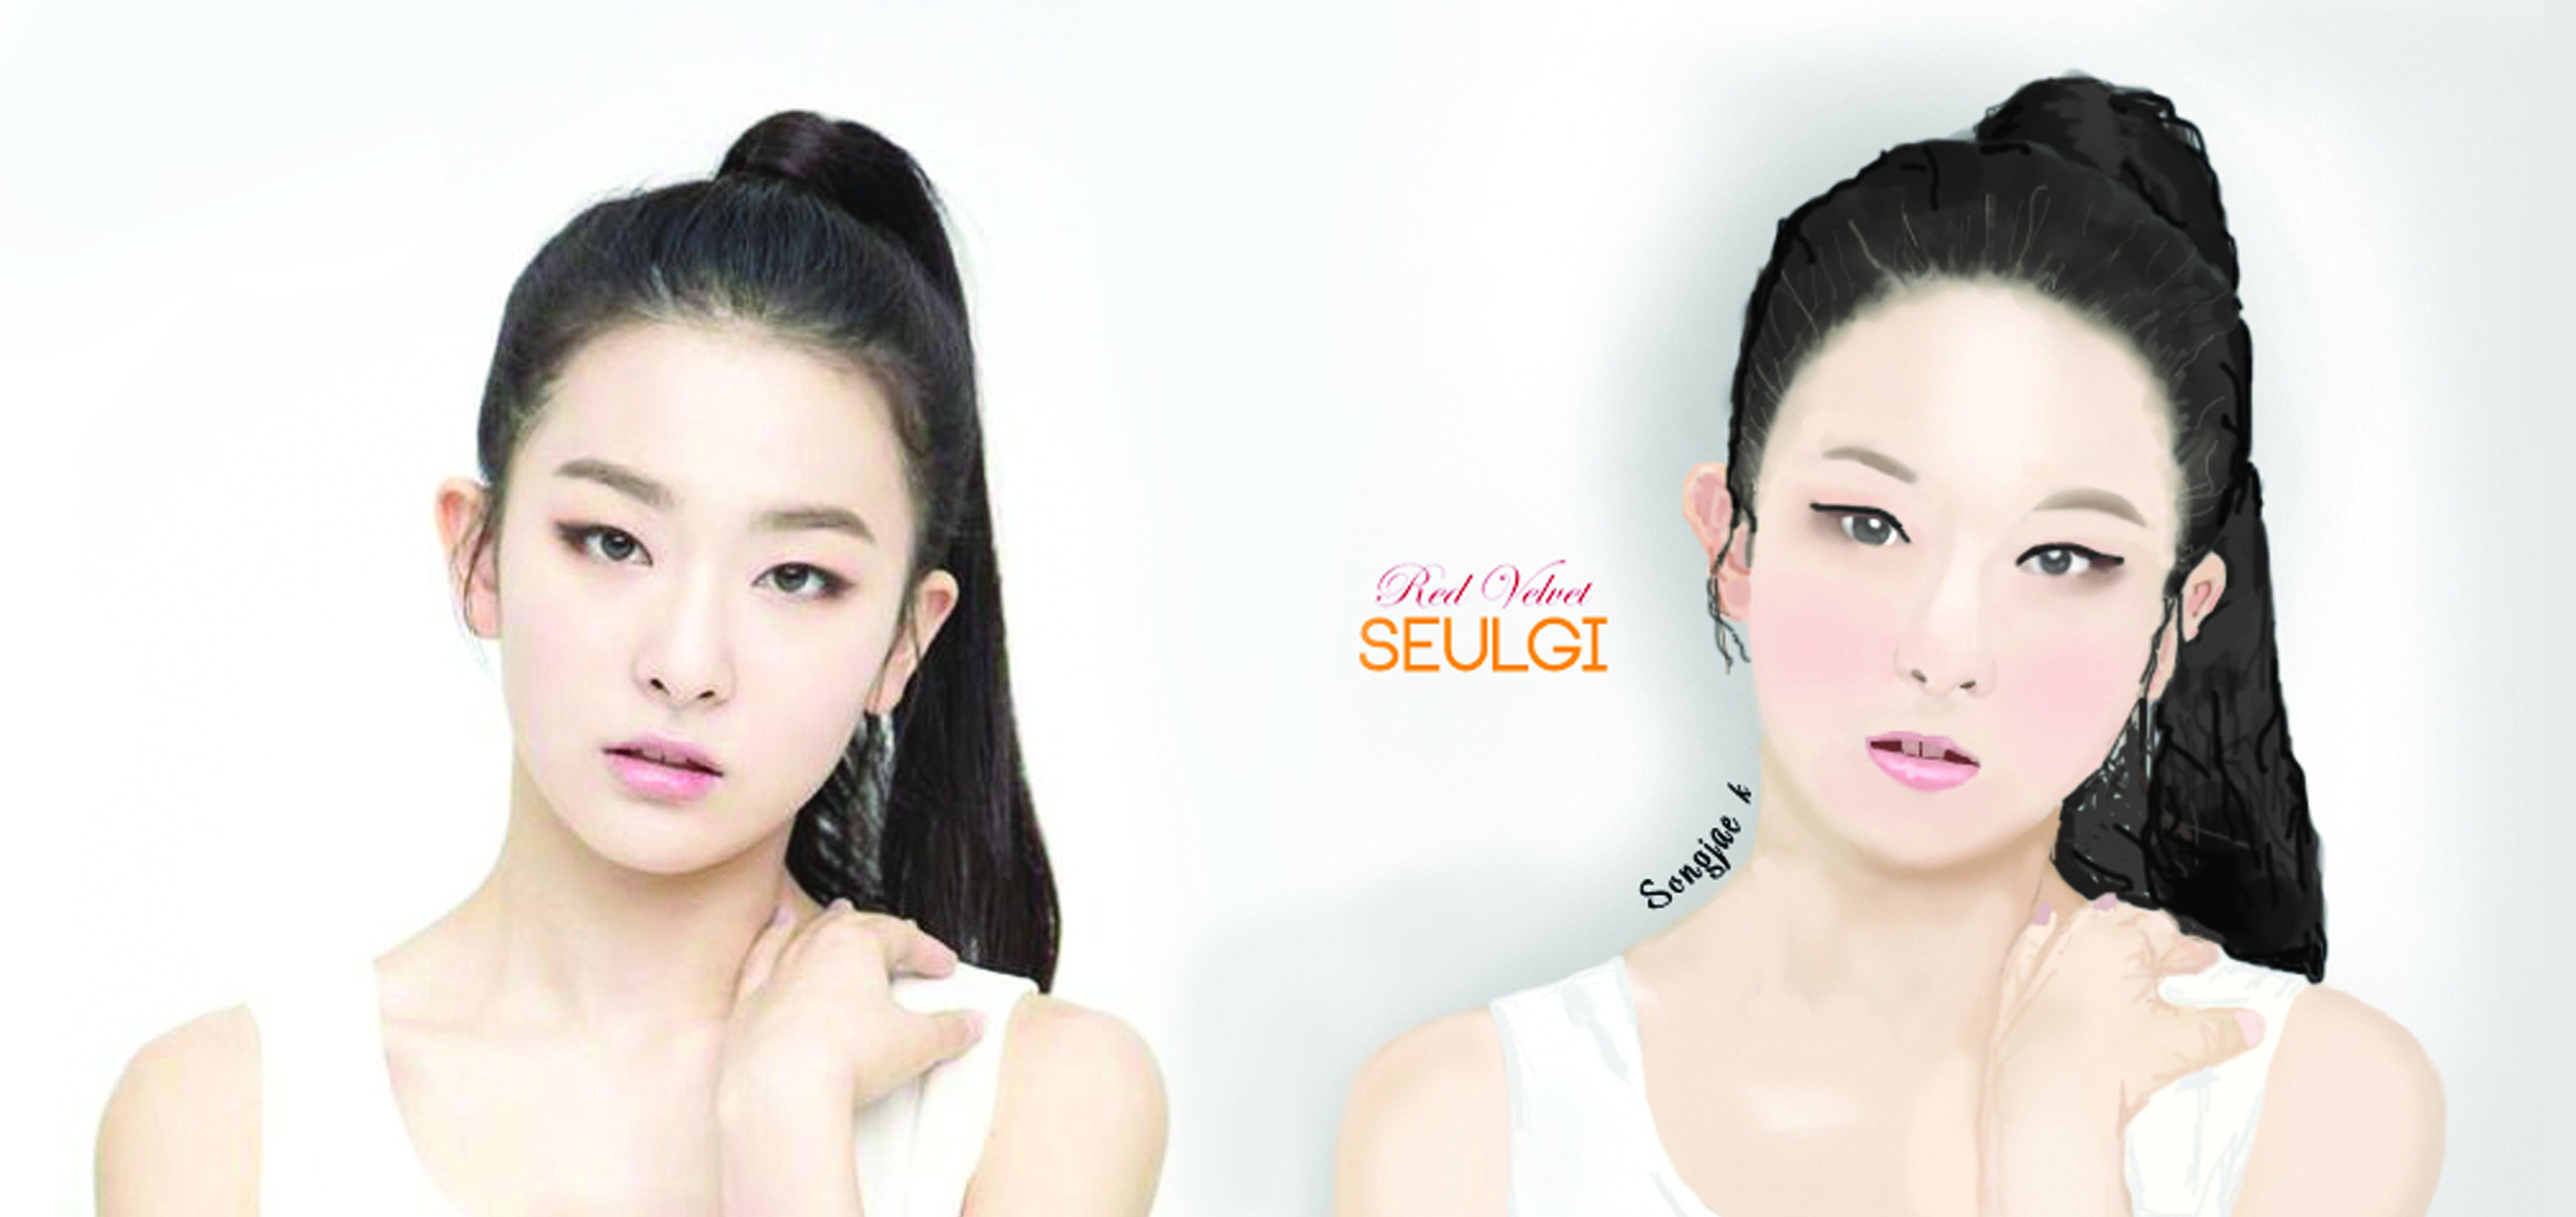 Seulgi red velvet by using photoshop